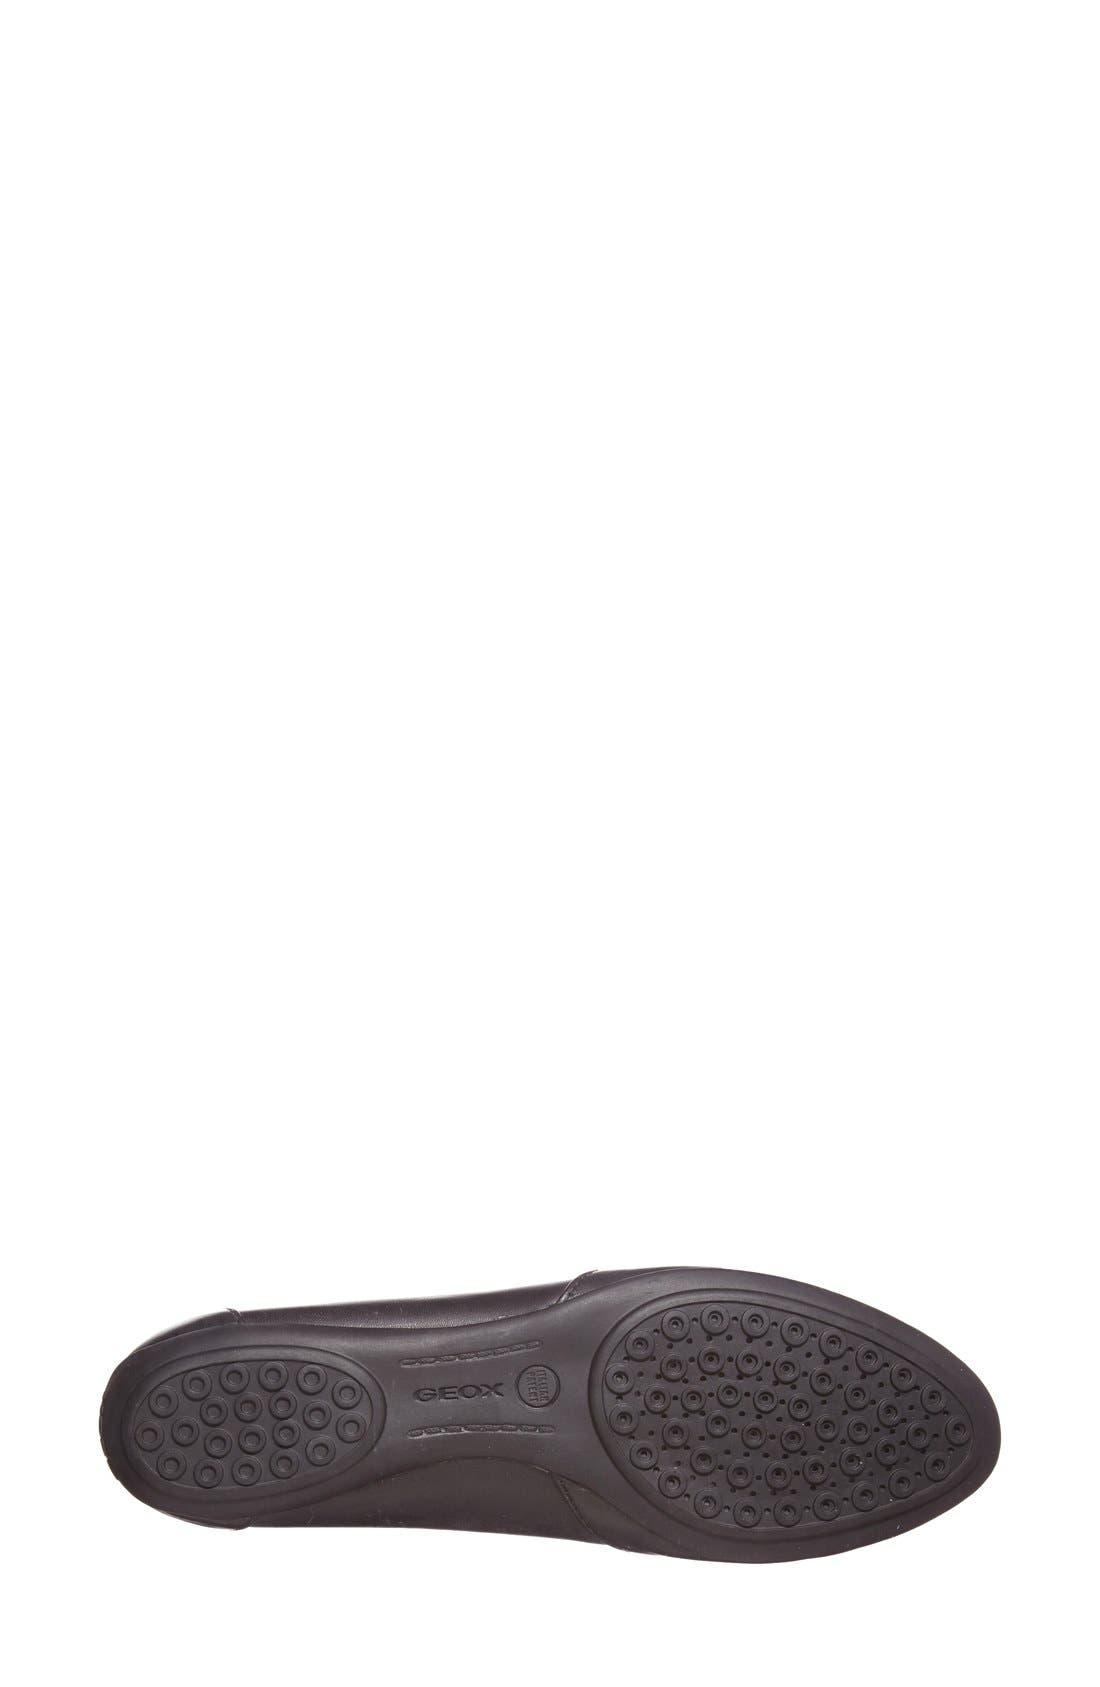 Alternate Image 4  - Geox 'Charlene' Leather Flat (Women)